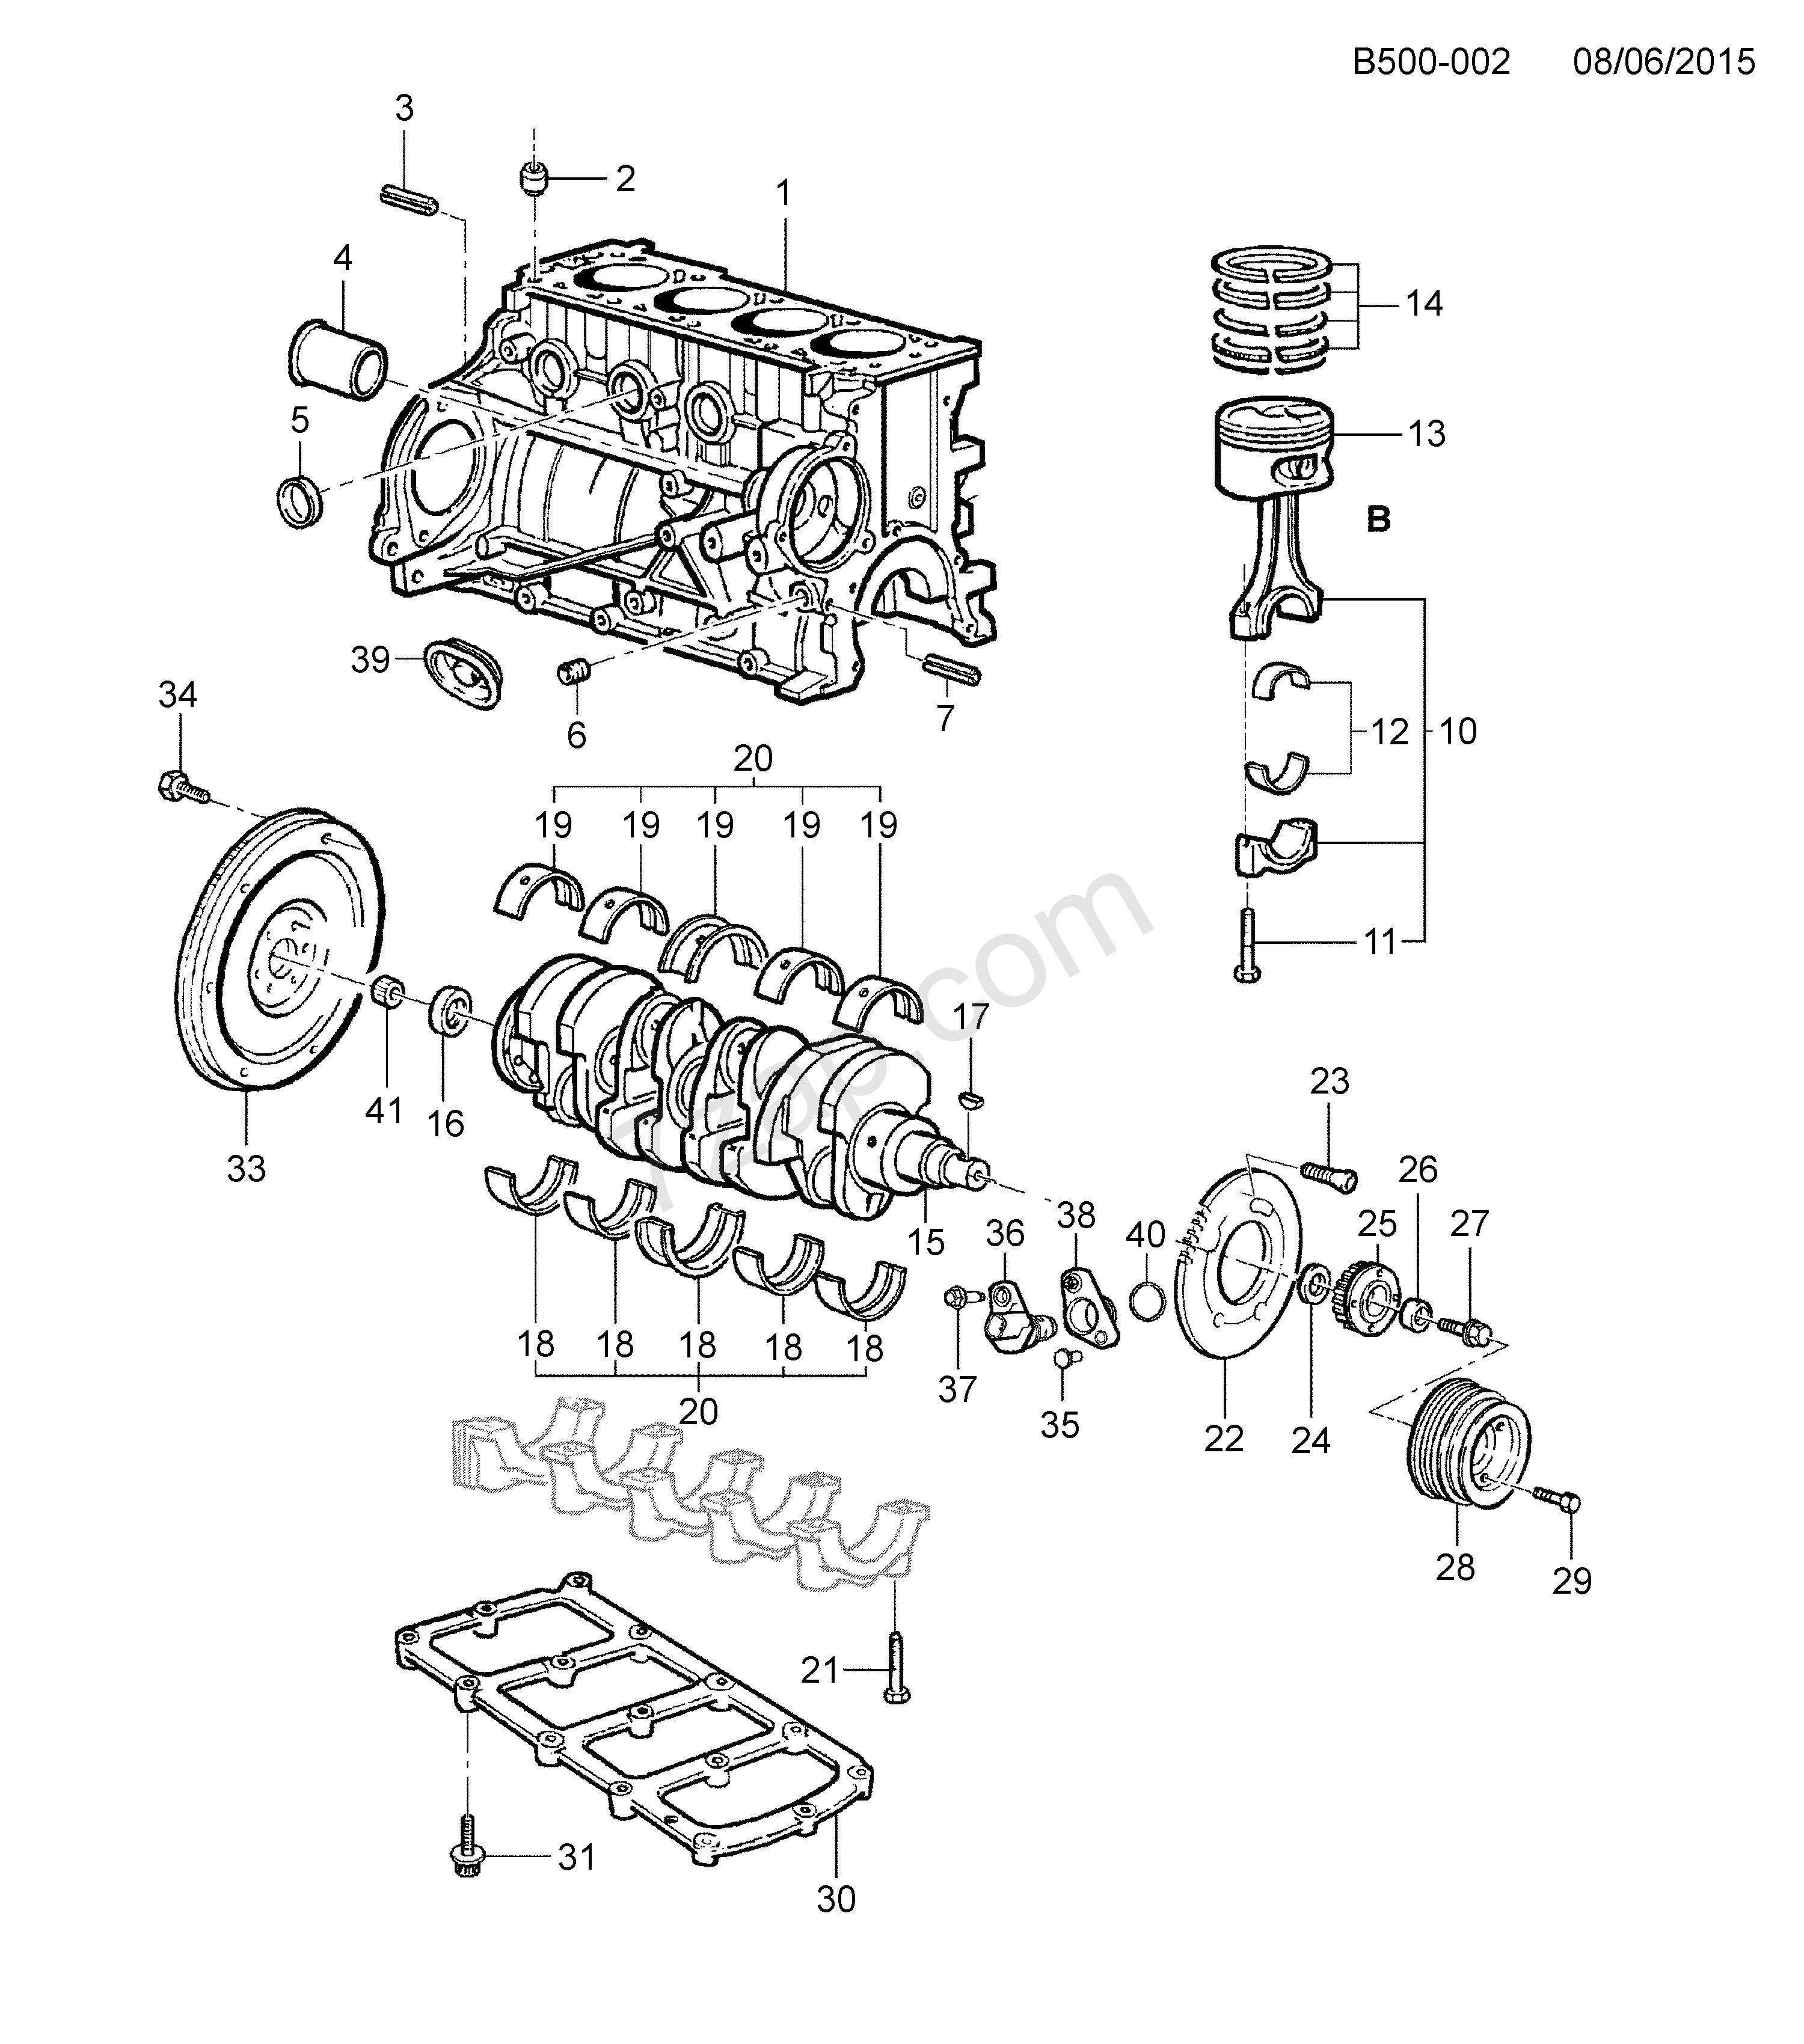 2006 chevy trailblazer parts diagram dodge electronic power steering 4 2 engine  wiring